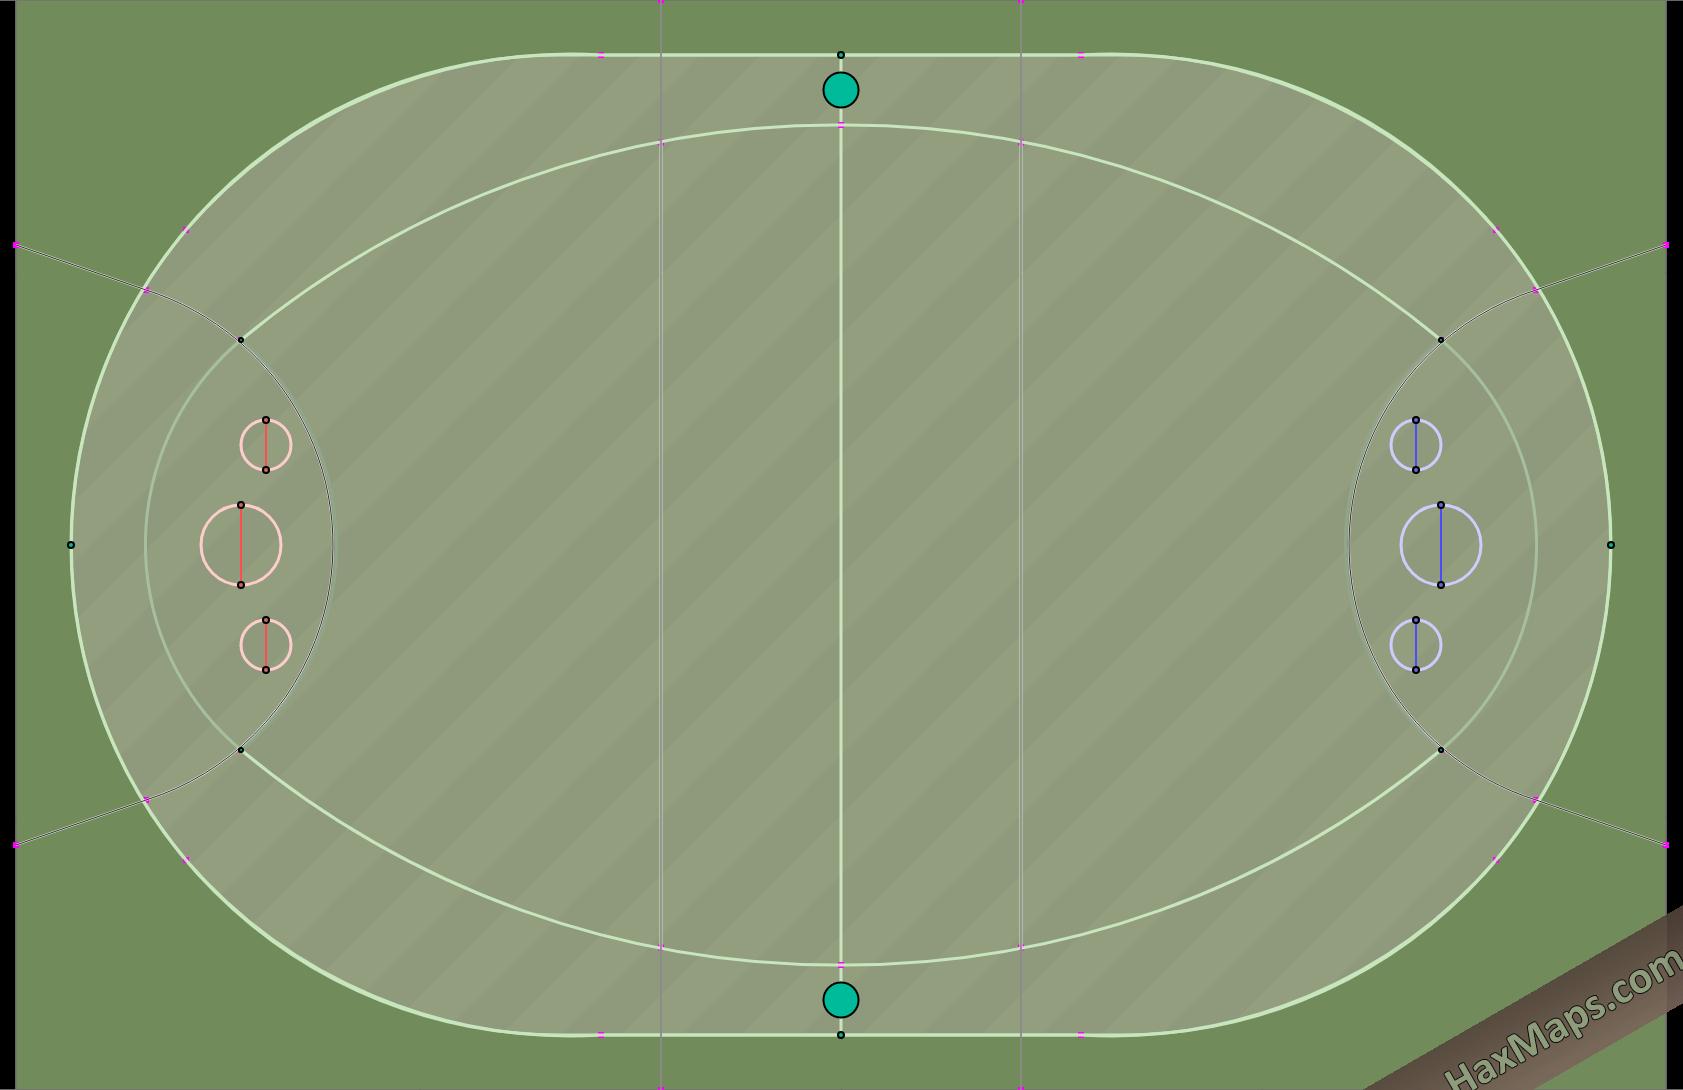 hax ball maps | Quidditch x7 byTatiCT